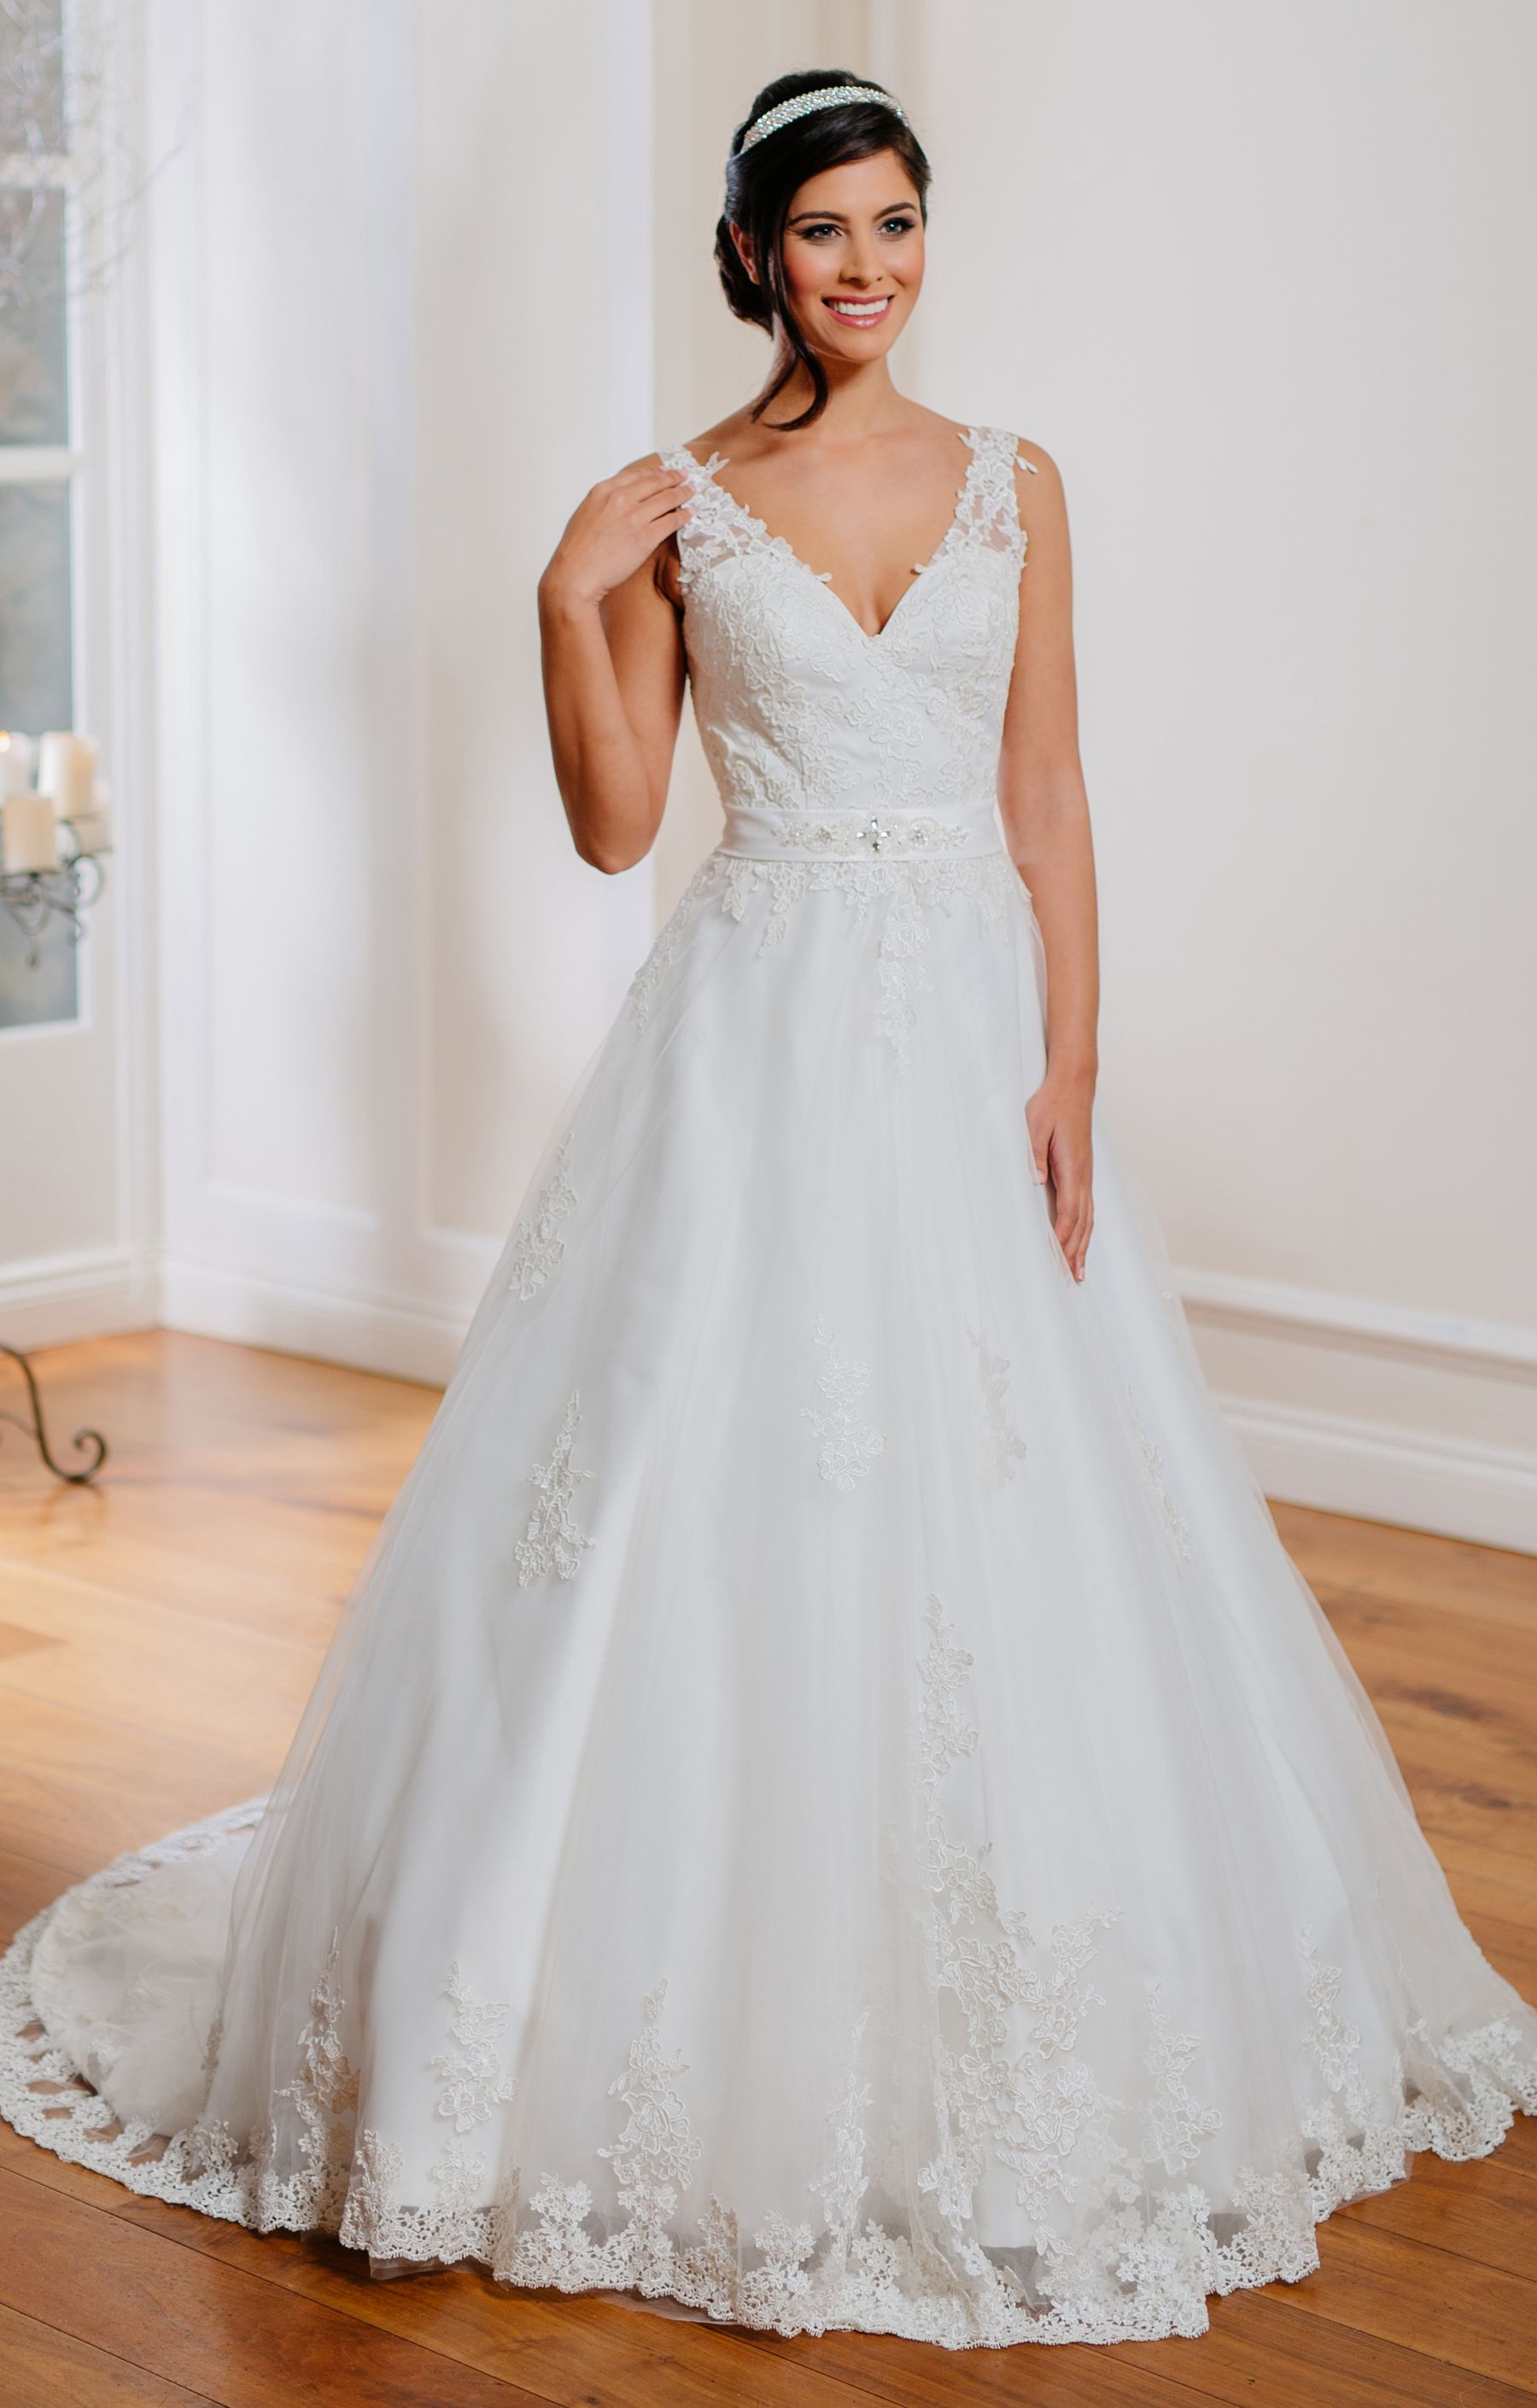 46++ Wedding loans for bad credit uk ideas